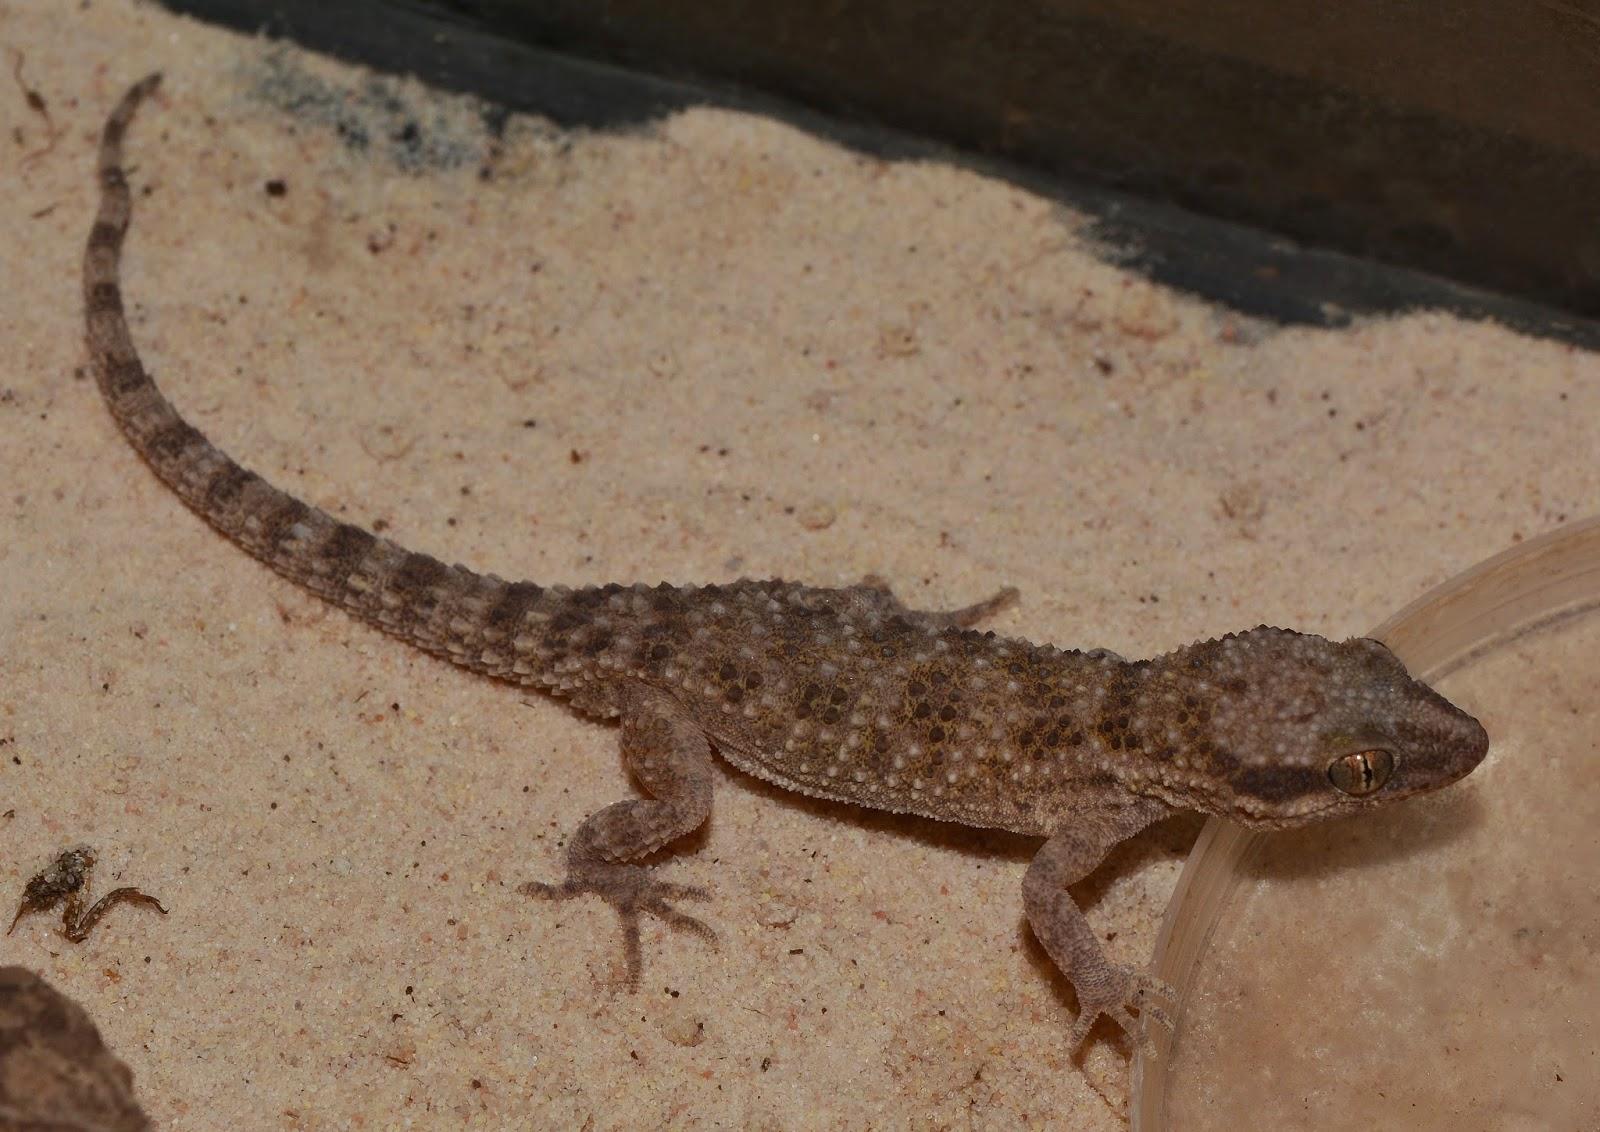 diaz lab reptiles: geckos